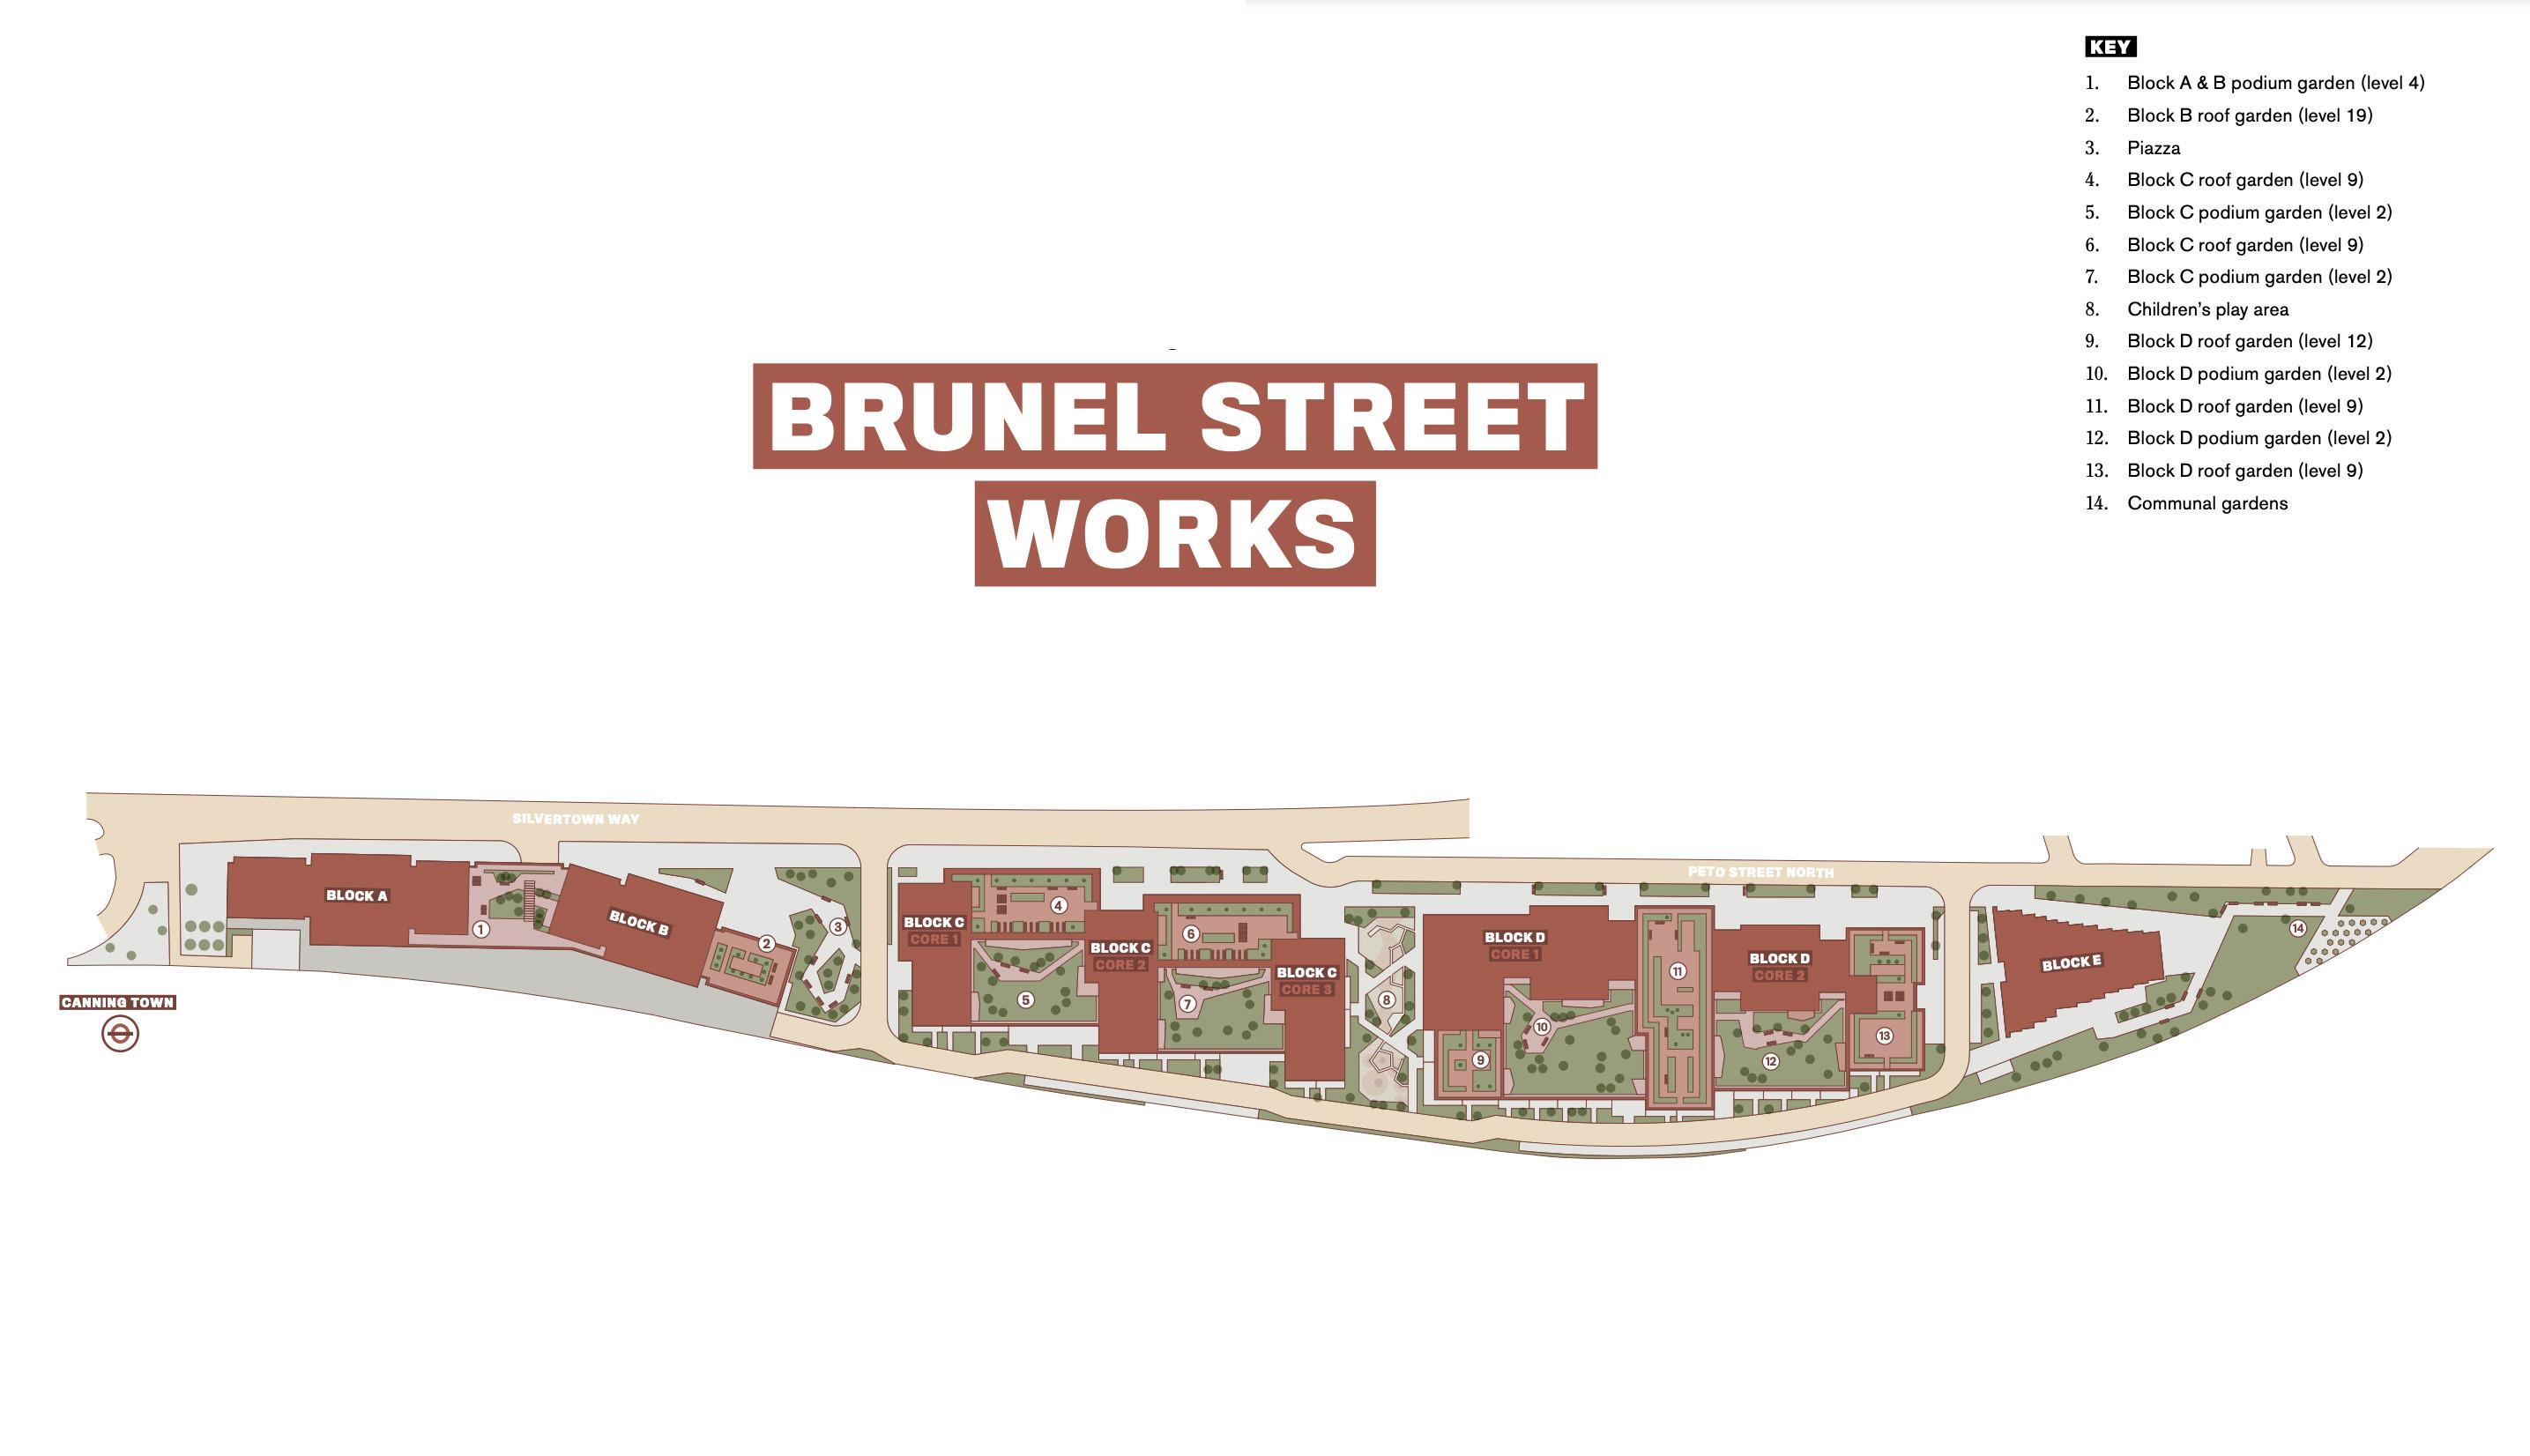 Brunel Street Works site plan in the development brochure at lindenhomes.co.uk.